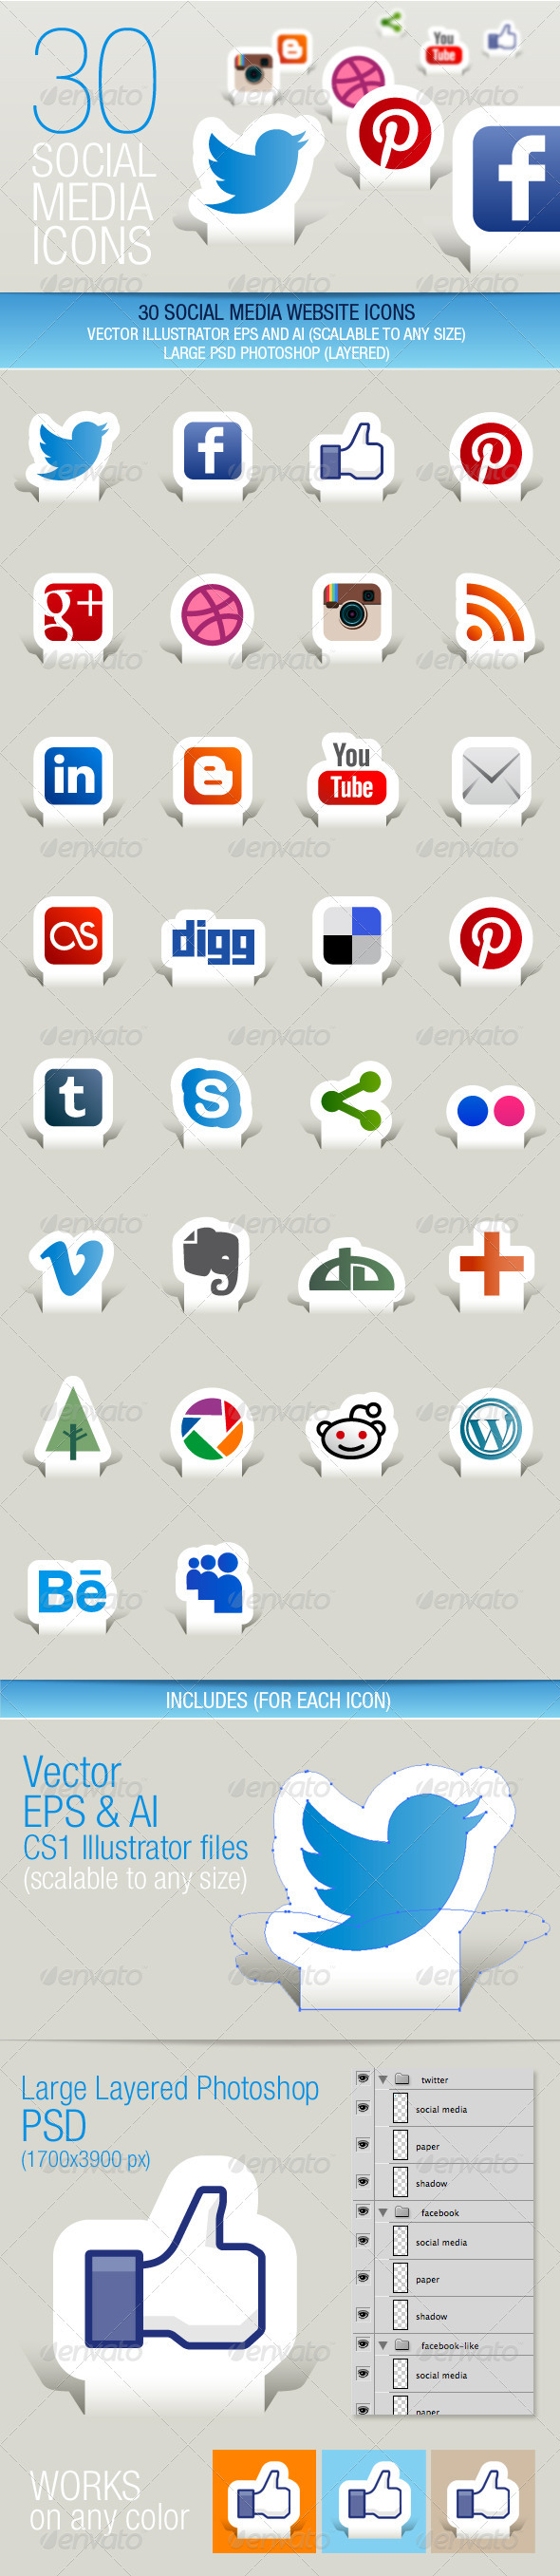 30 Social Media Icons (Paper Cut) - Media Icons